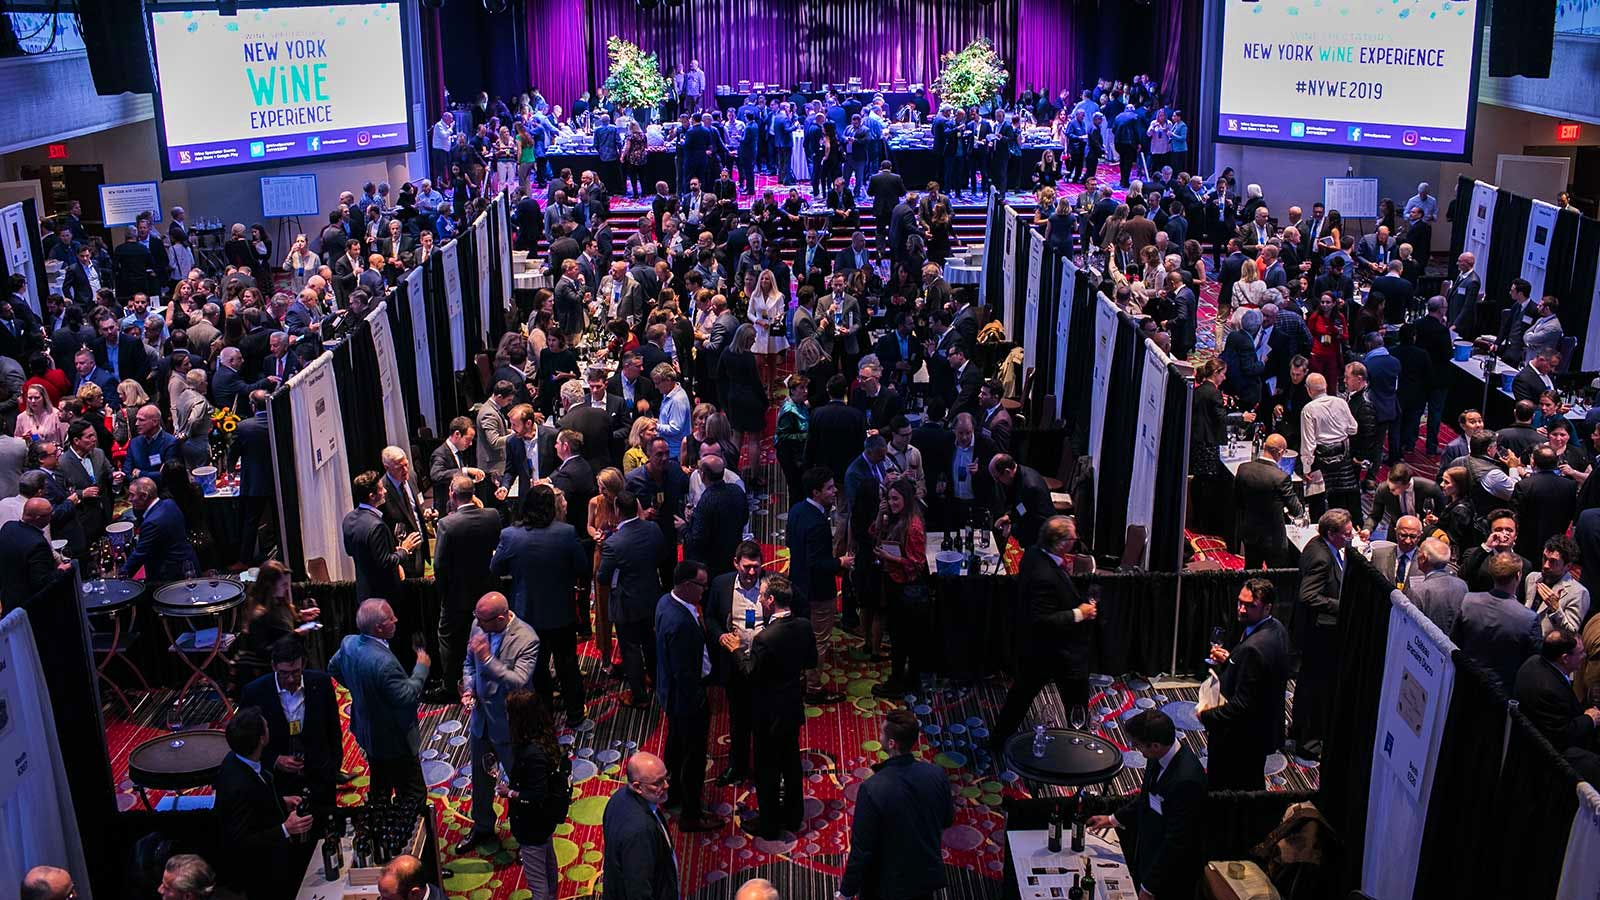 2019 Grand Tastings: Sharing the Joy of Wine